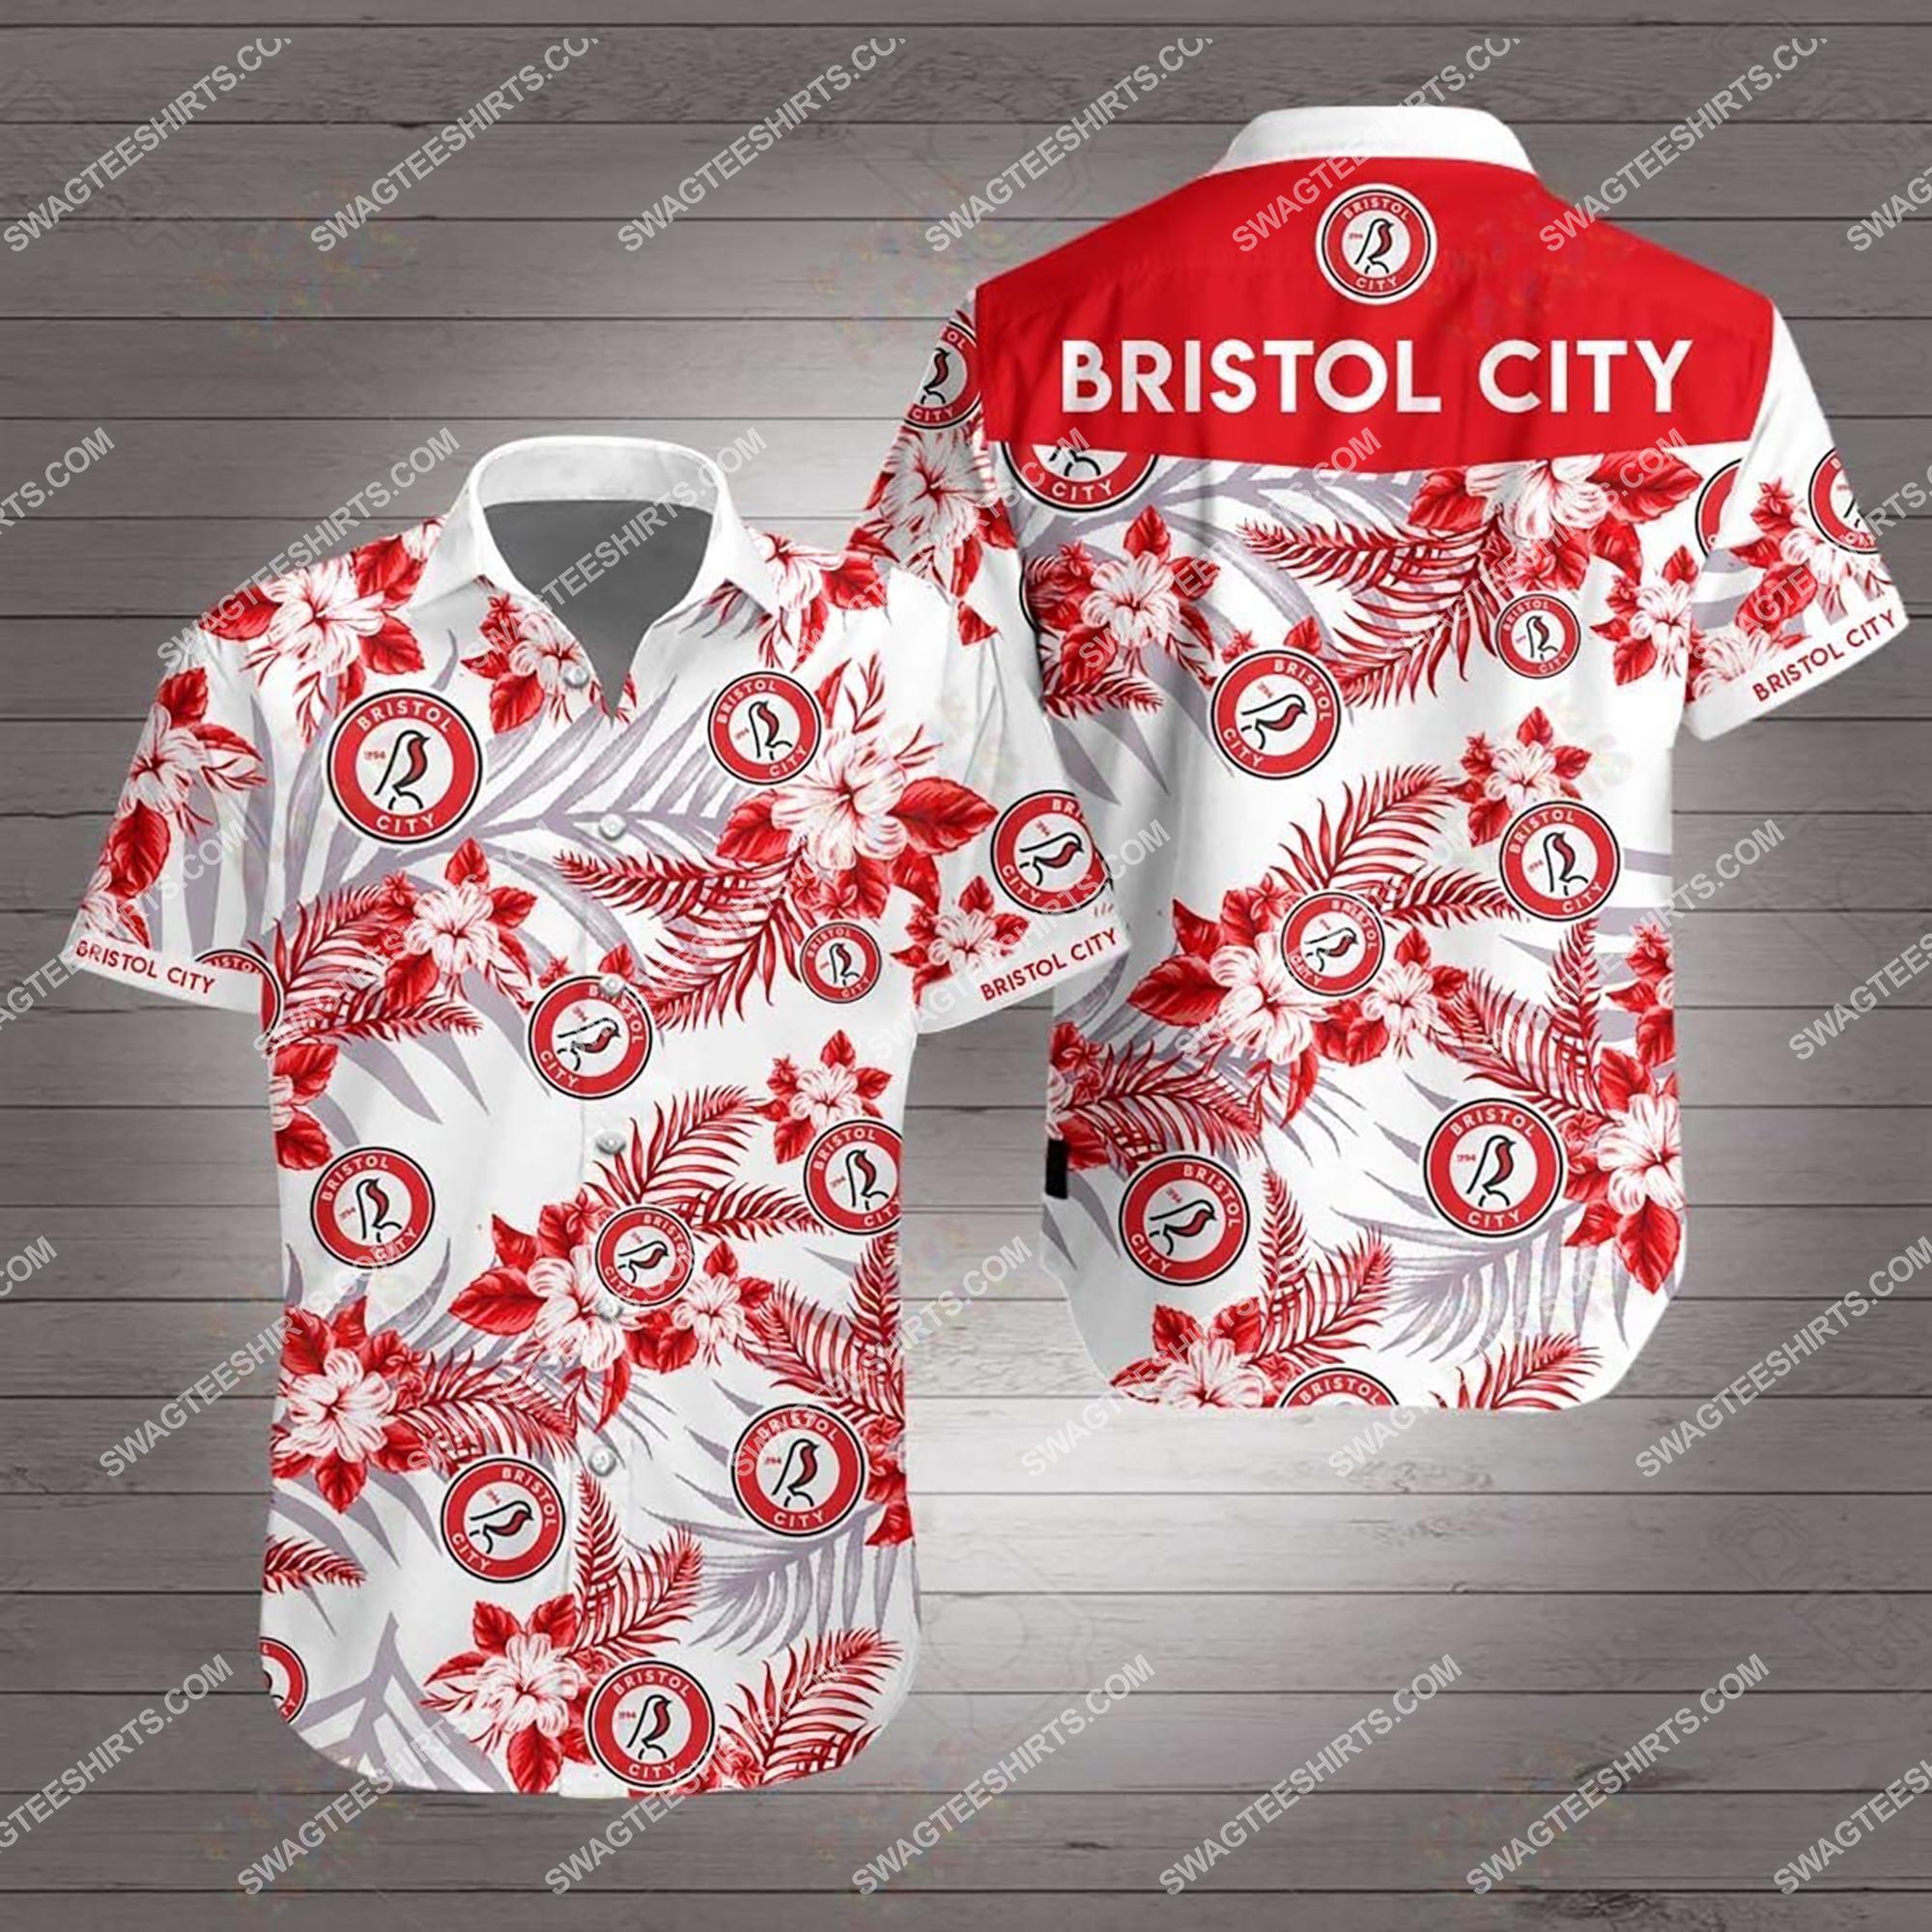 the bristol city fc full printing summer hawaiian shirt 2 - Copy (2)